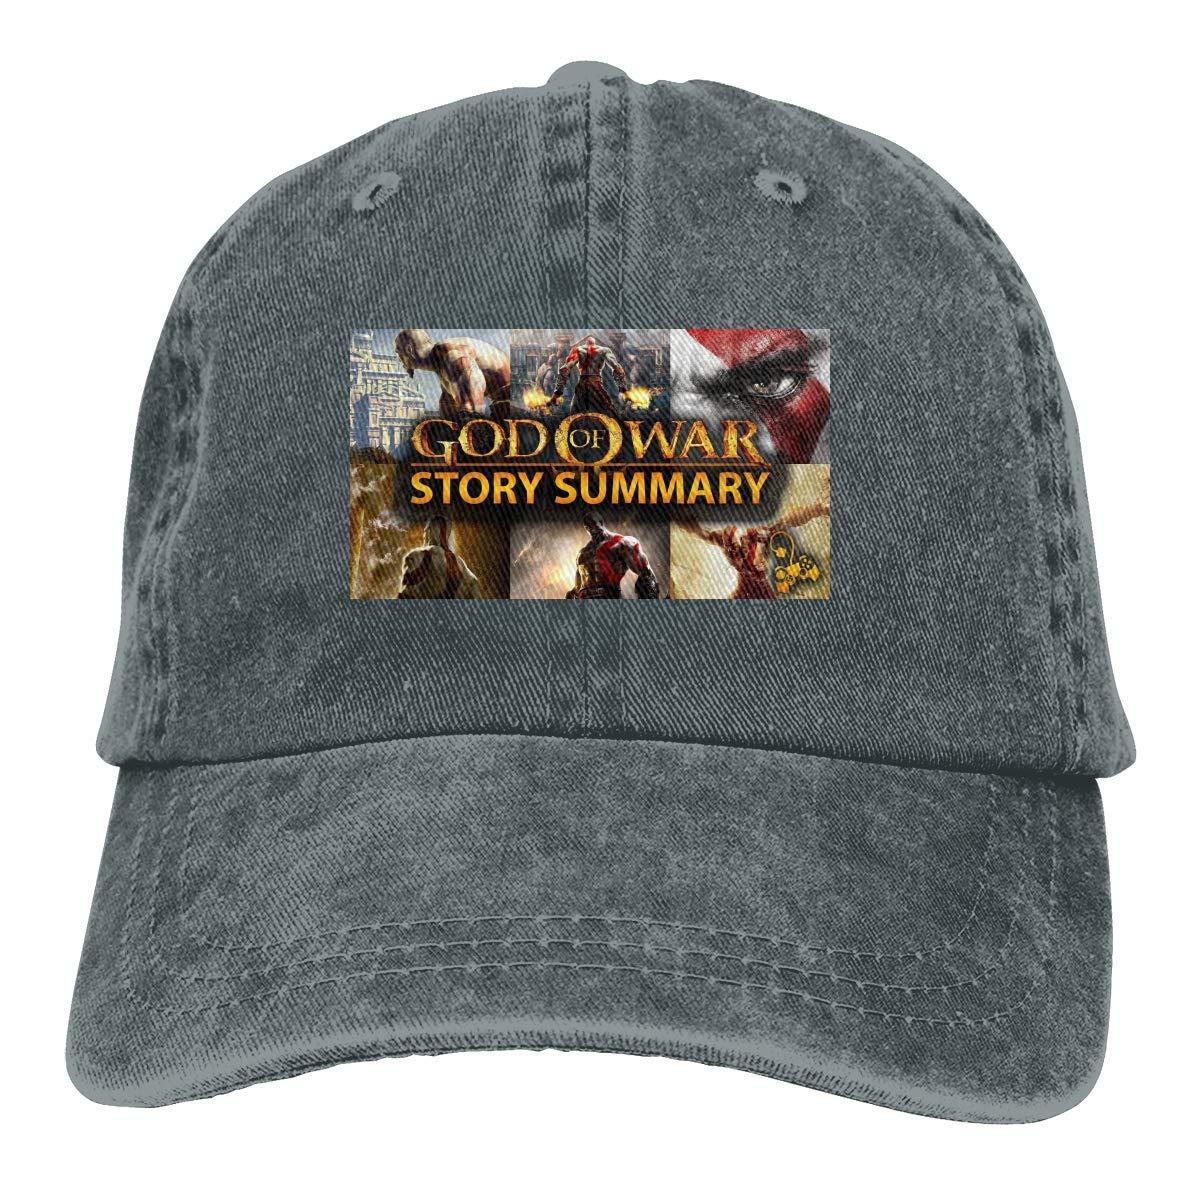 Snapback Cap Flat Bill Hats Adjustable Blank Caps for Men Women